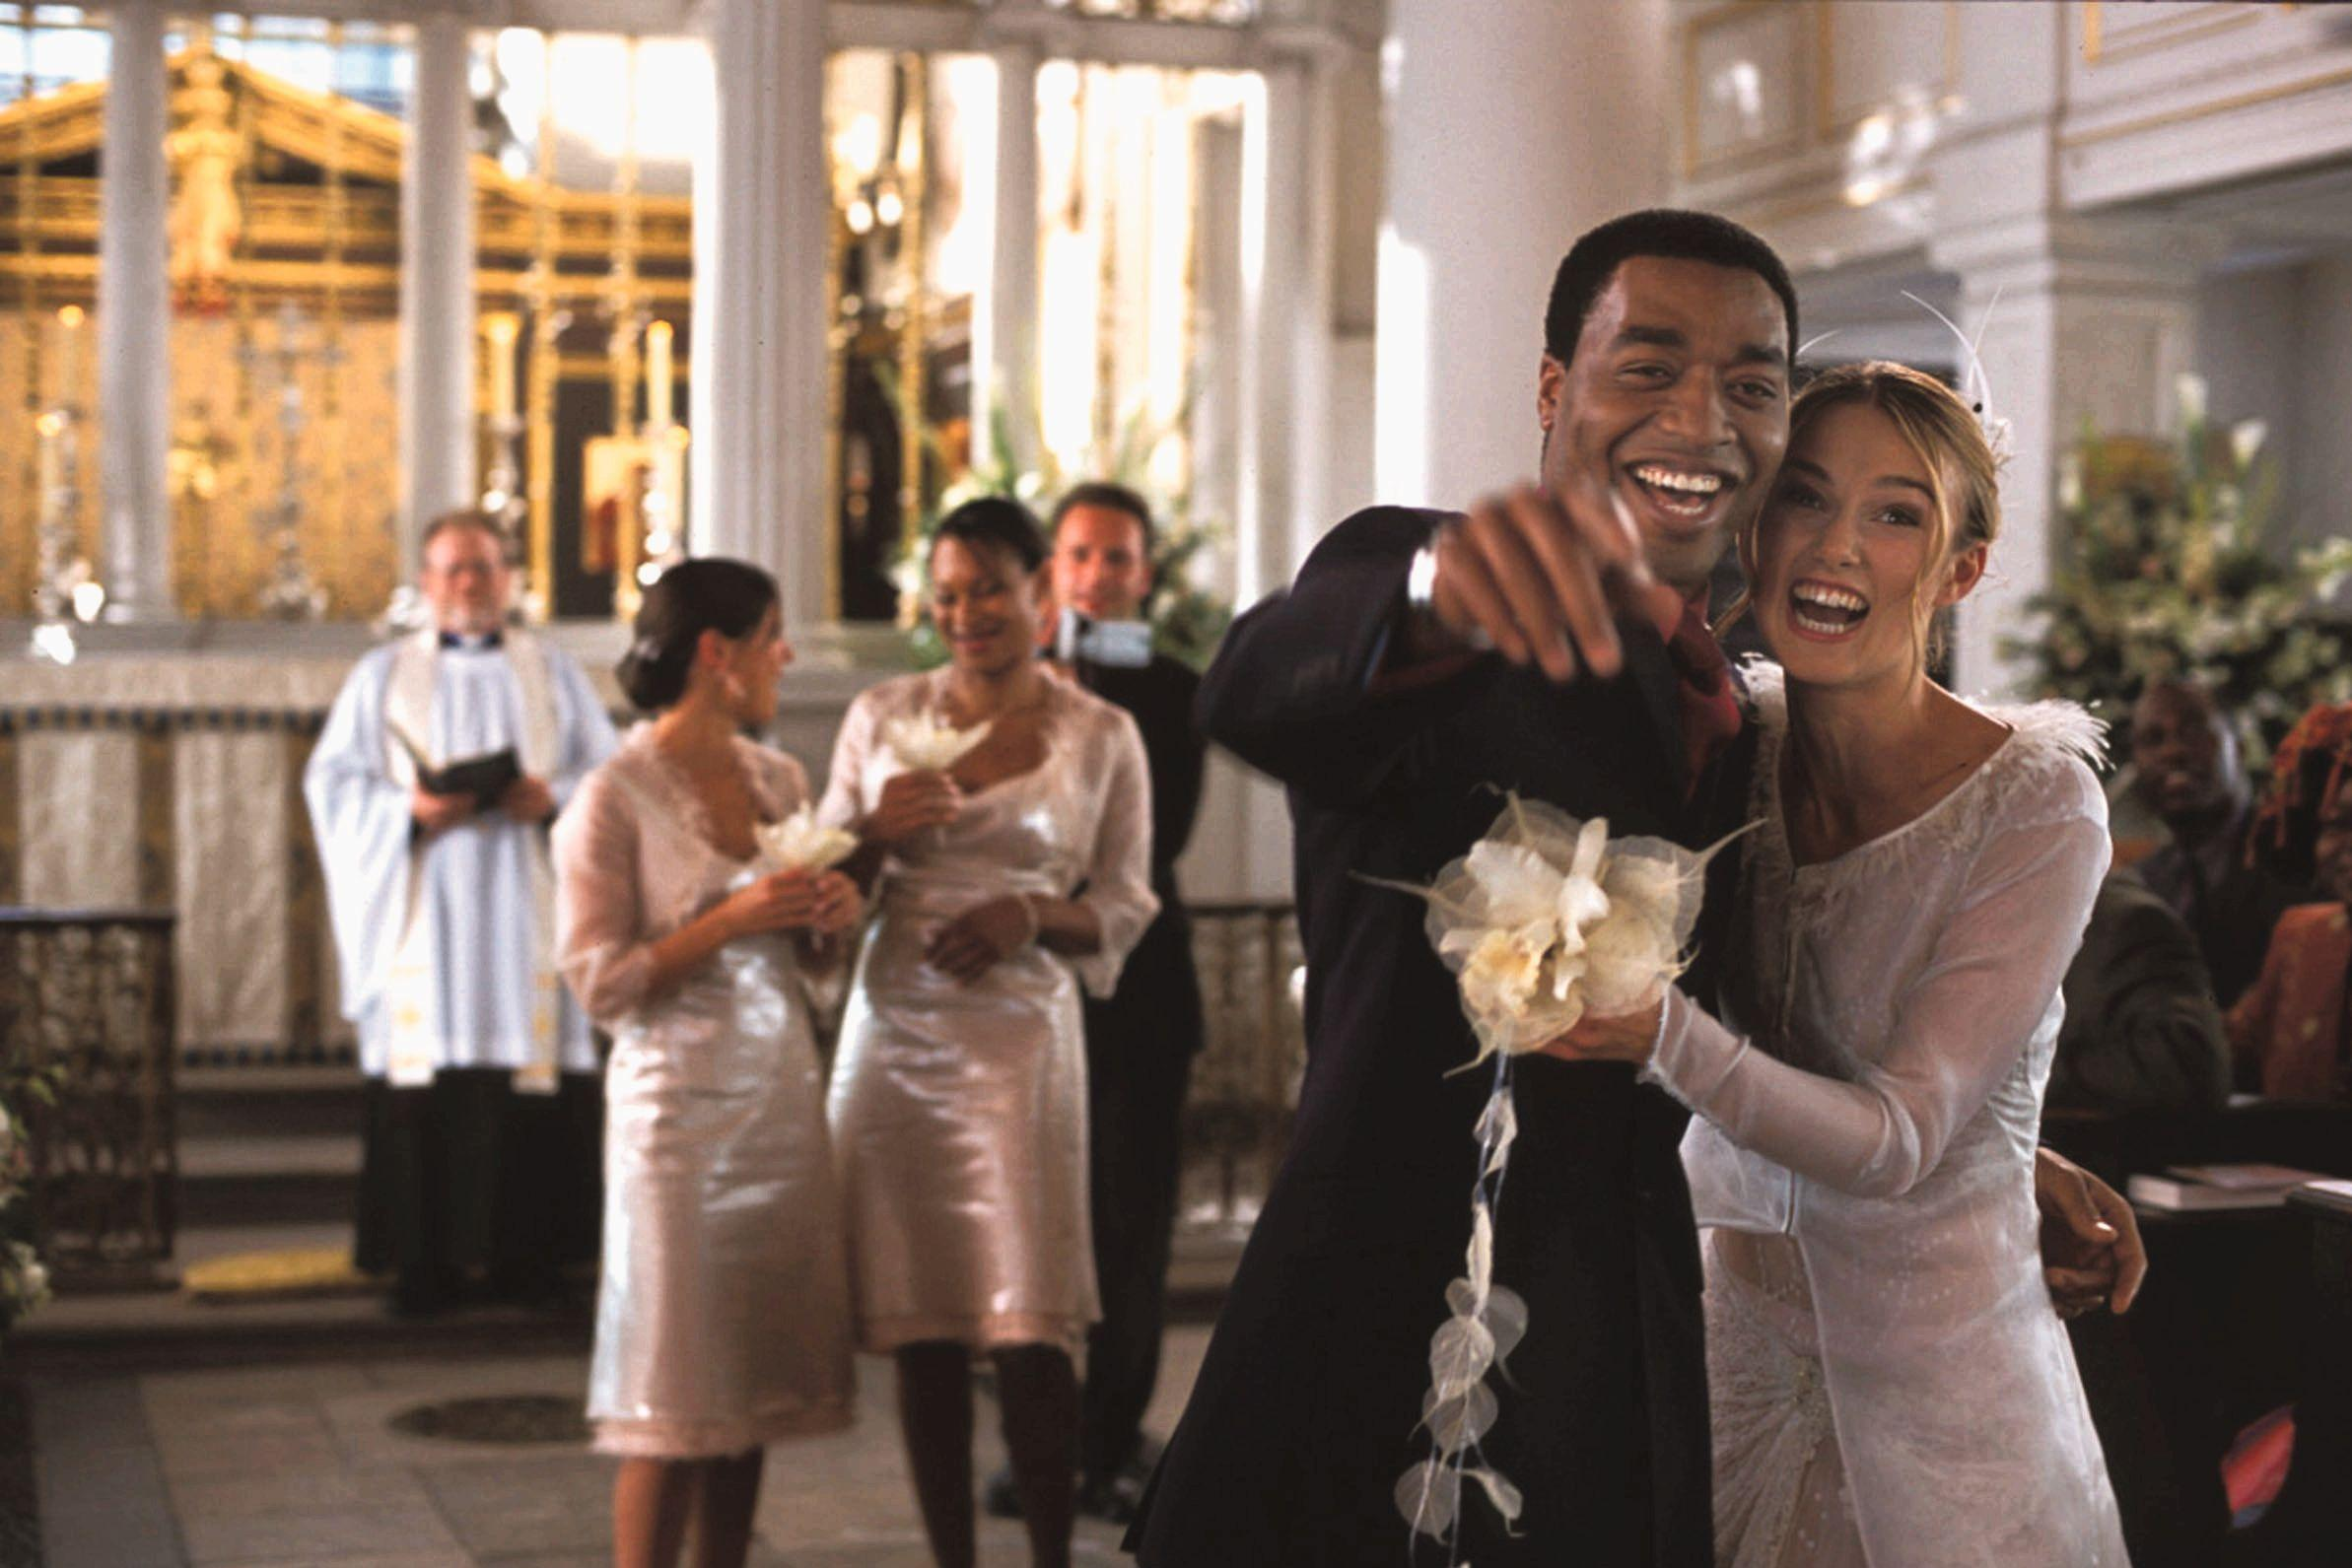 Tatler unveils 'social media rulebook for brides' including ban on 'honeymoon spam'